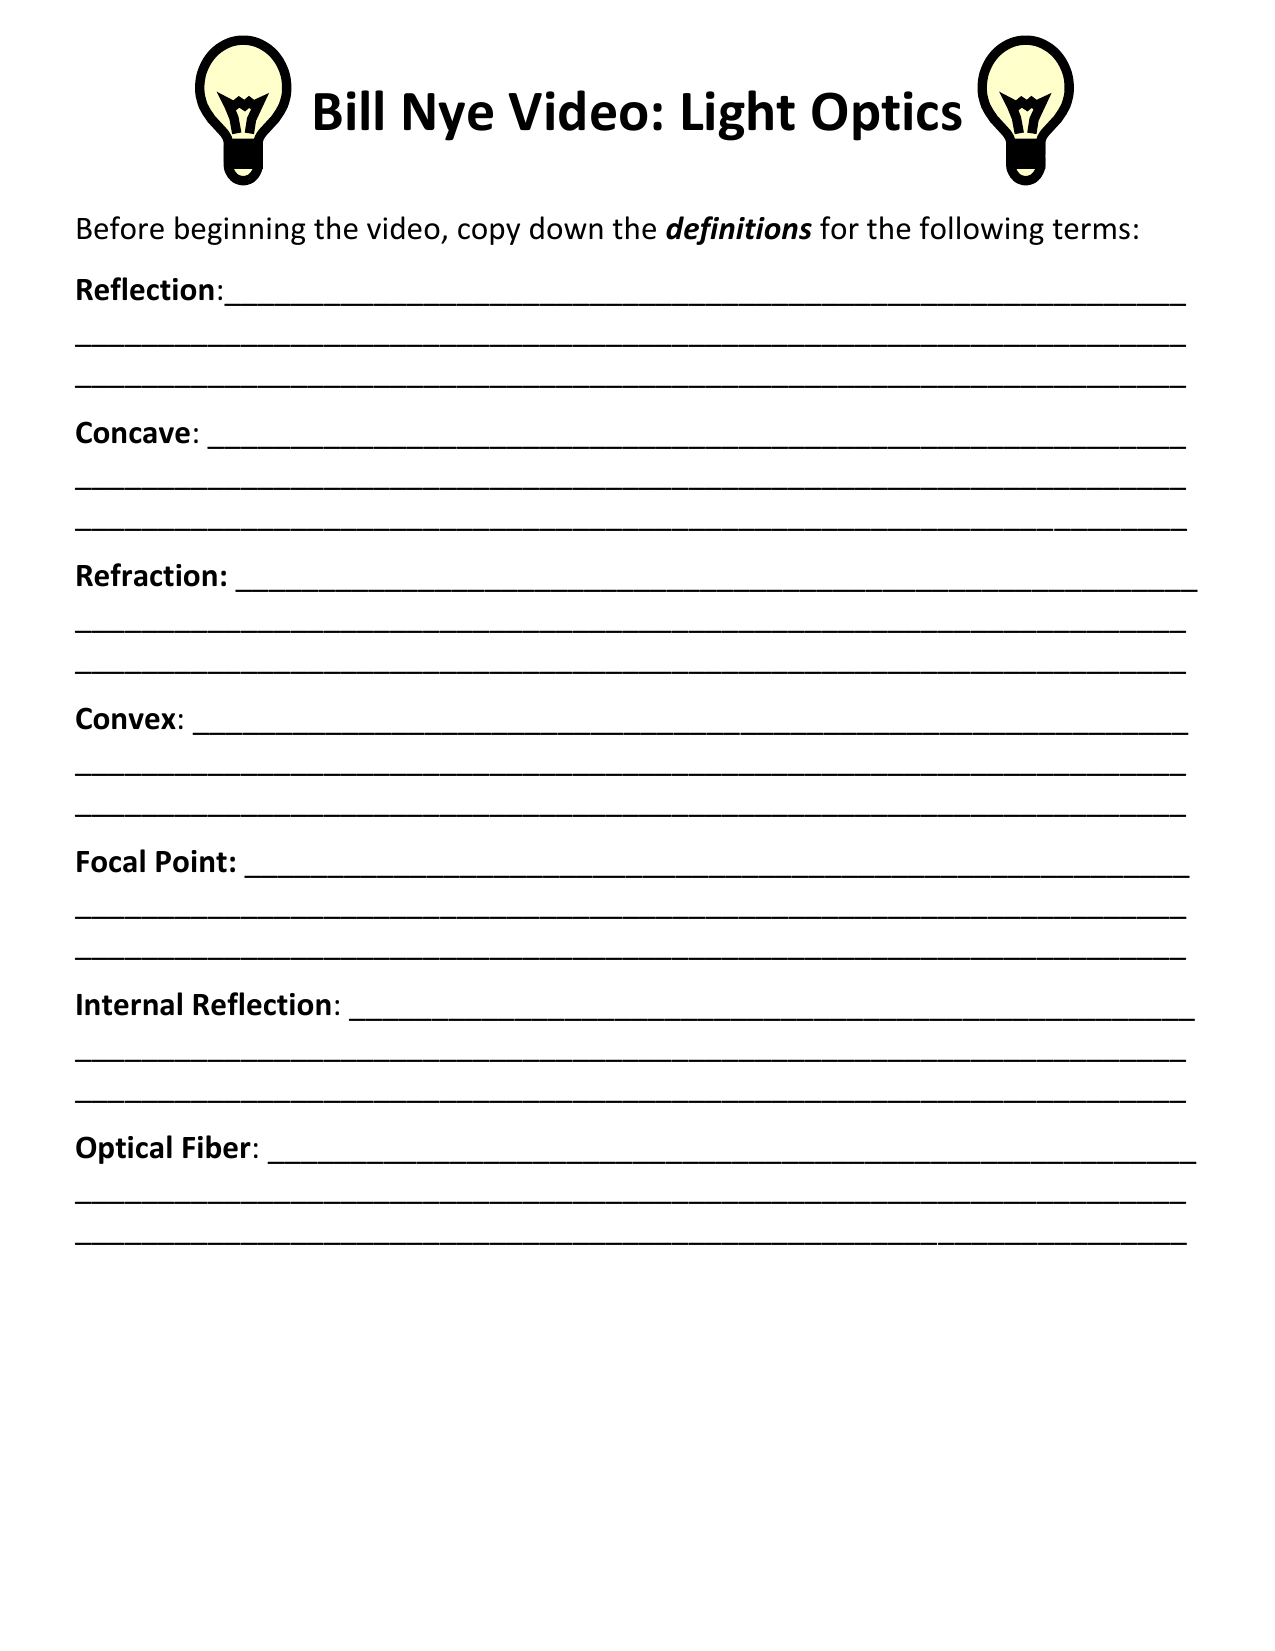 Worksheets Bill Nye Worksheets 04 bill nye light optics video worksheet